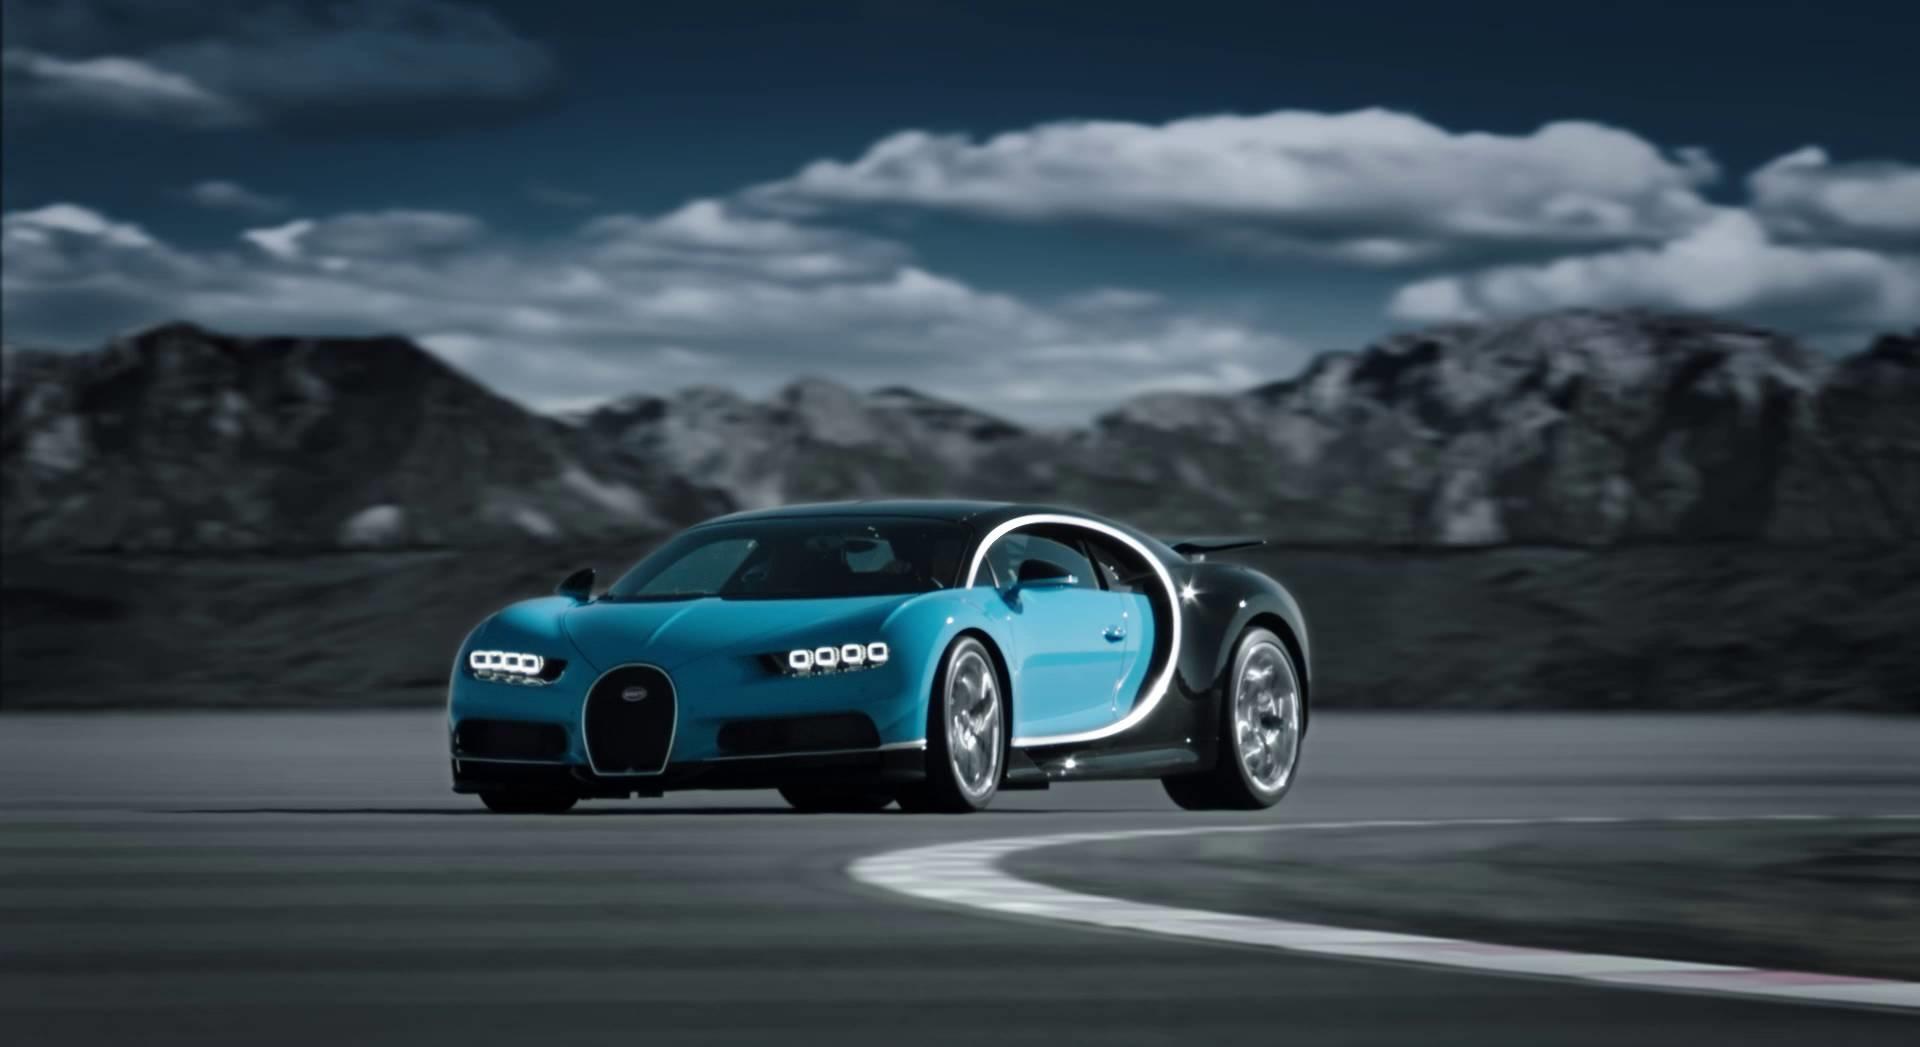 79 Bugatti Chiron 2018 Wallpapers On Wallpapersafari